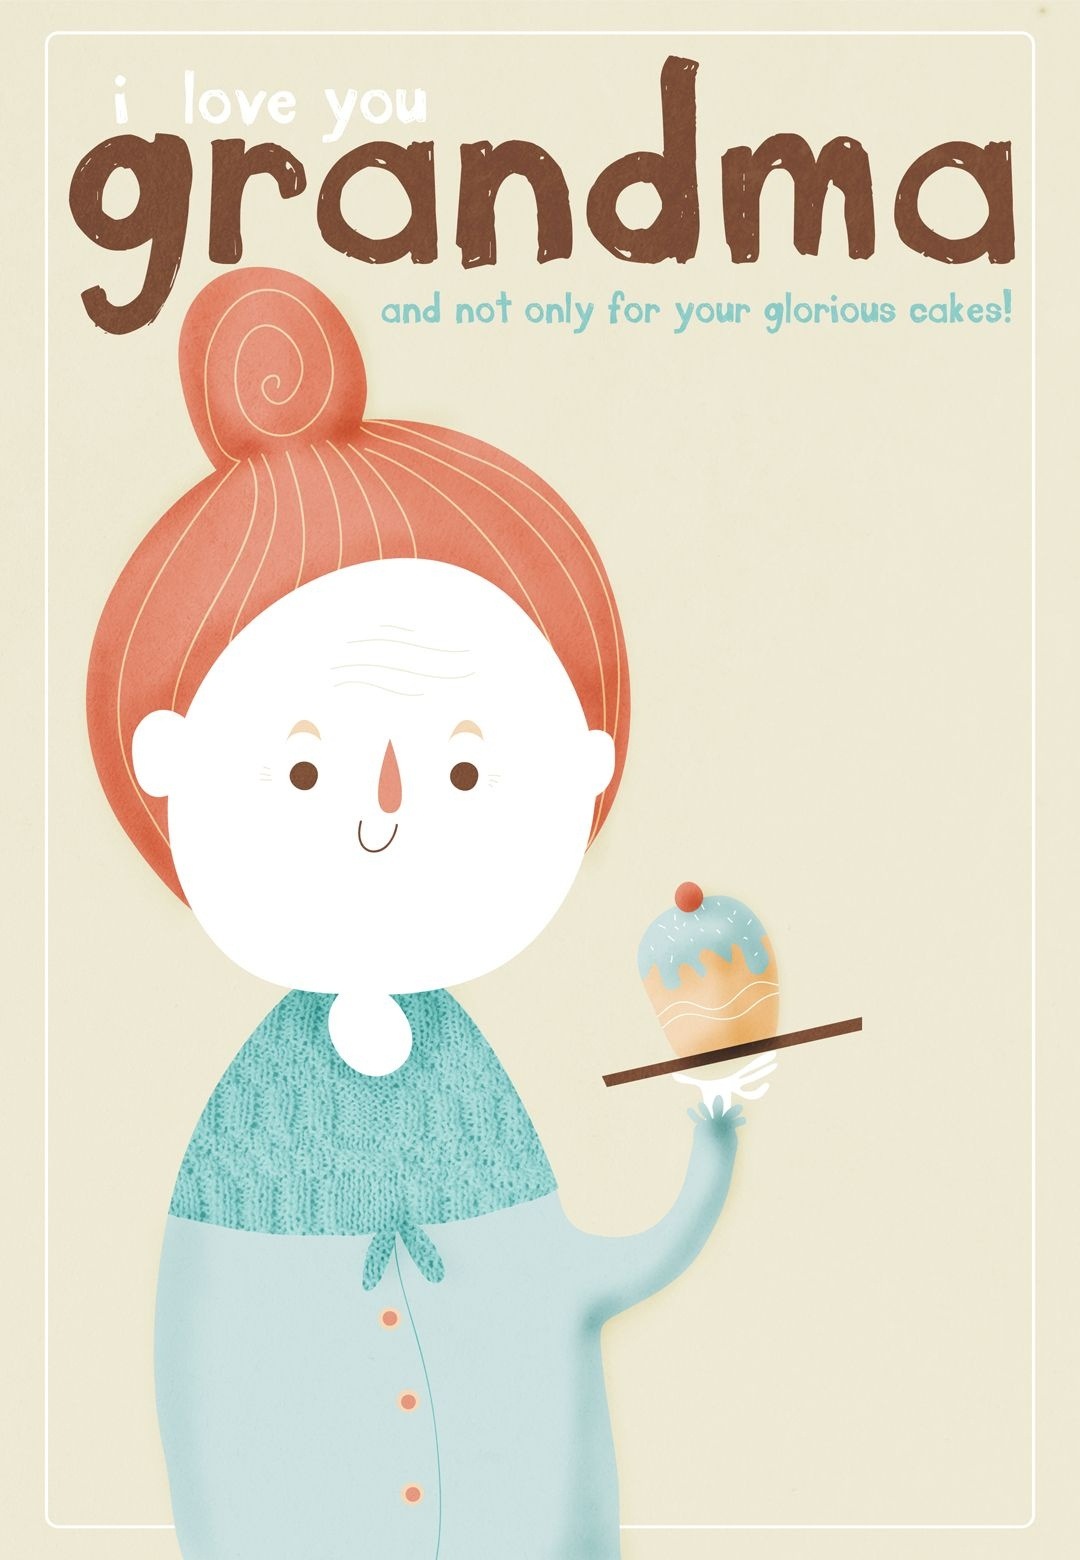 Free Printable I Love You Grandma Greeting Card | Grandparents Day - Grandparents Day Cards Printable Free